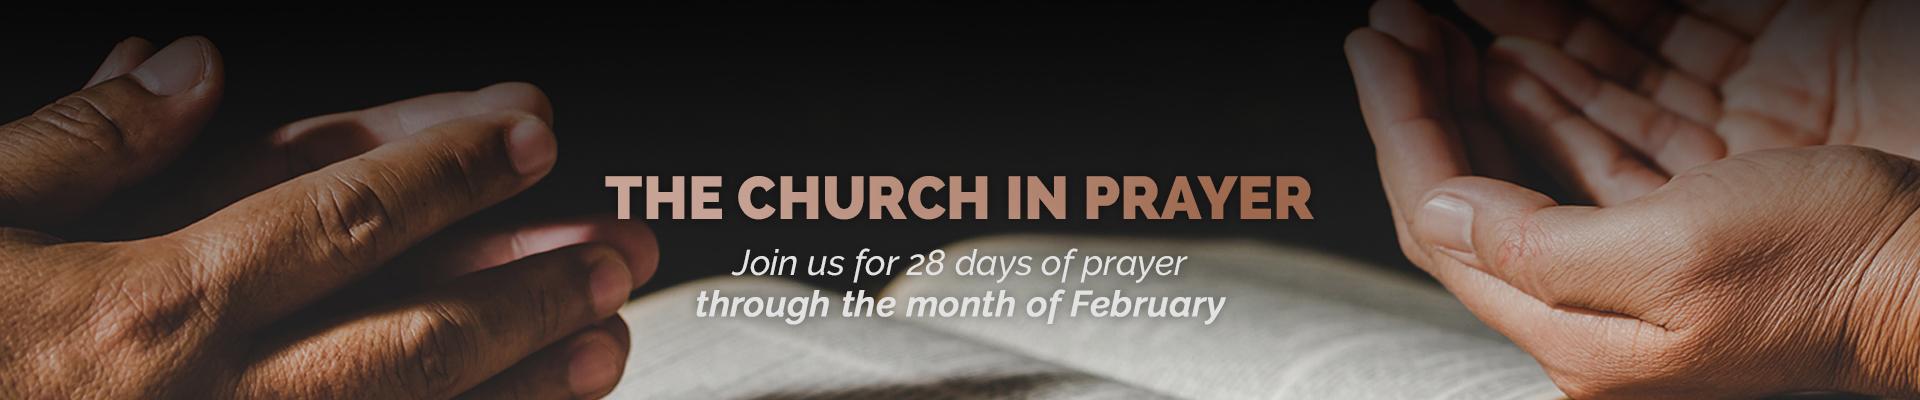 church in prayer PAGE